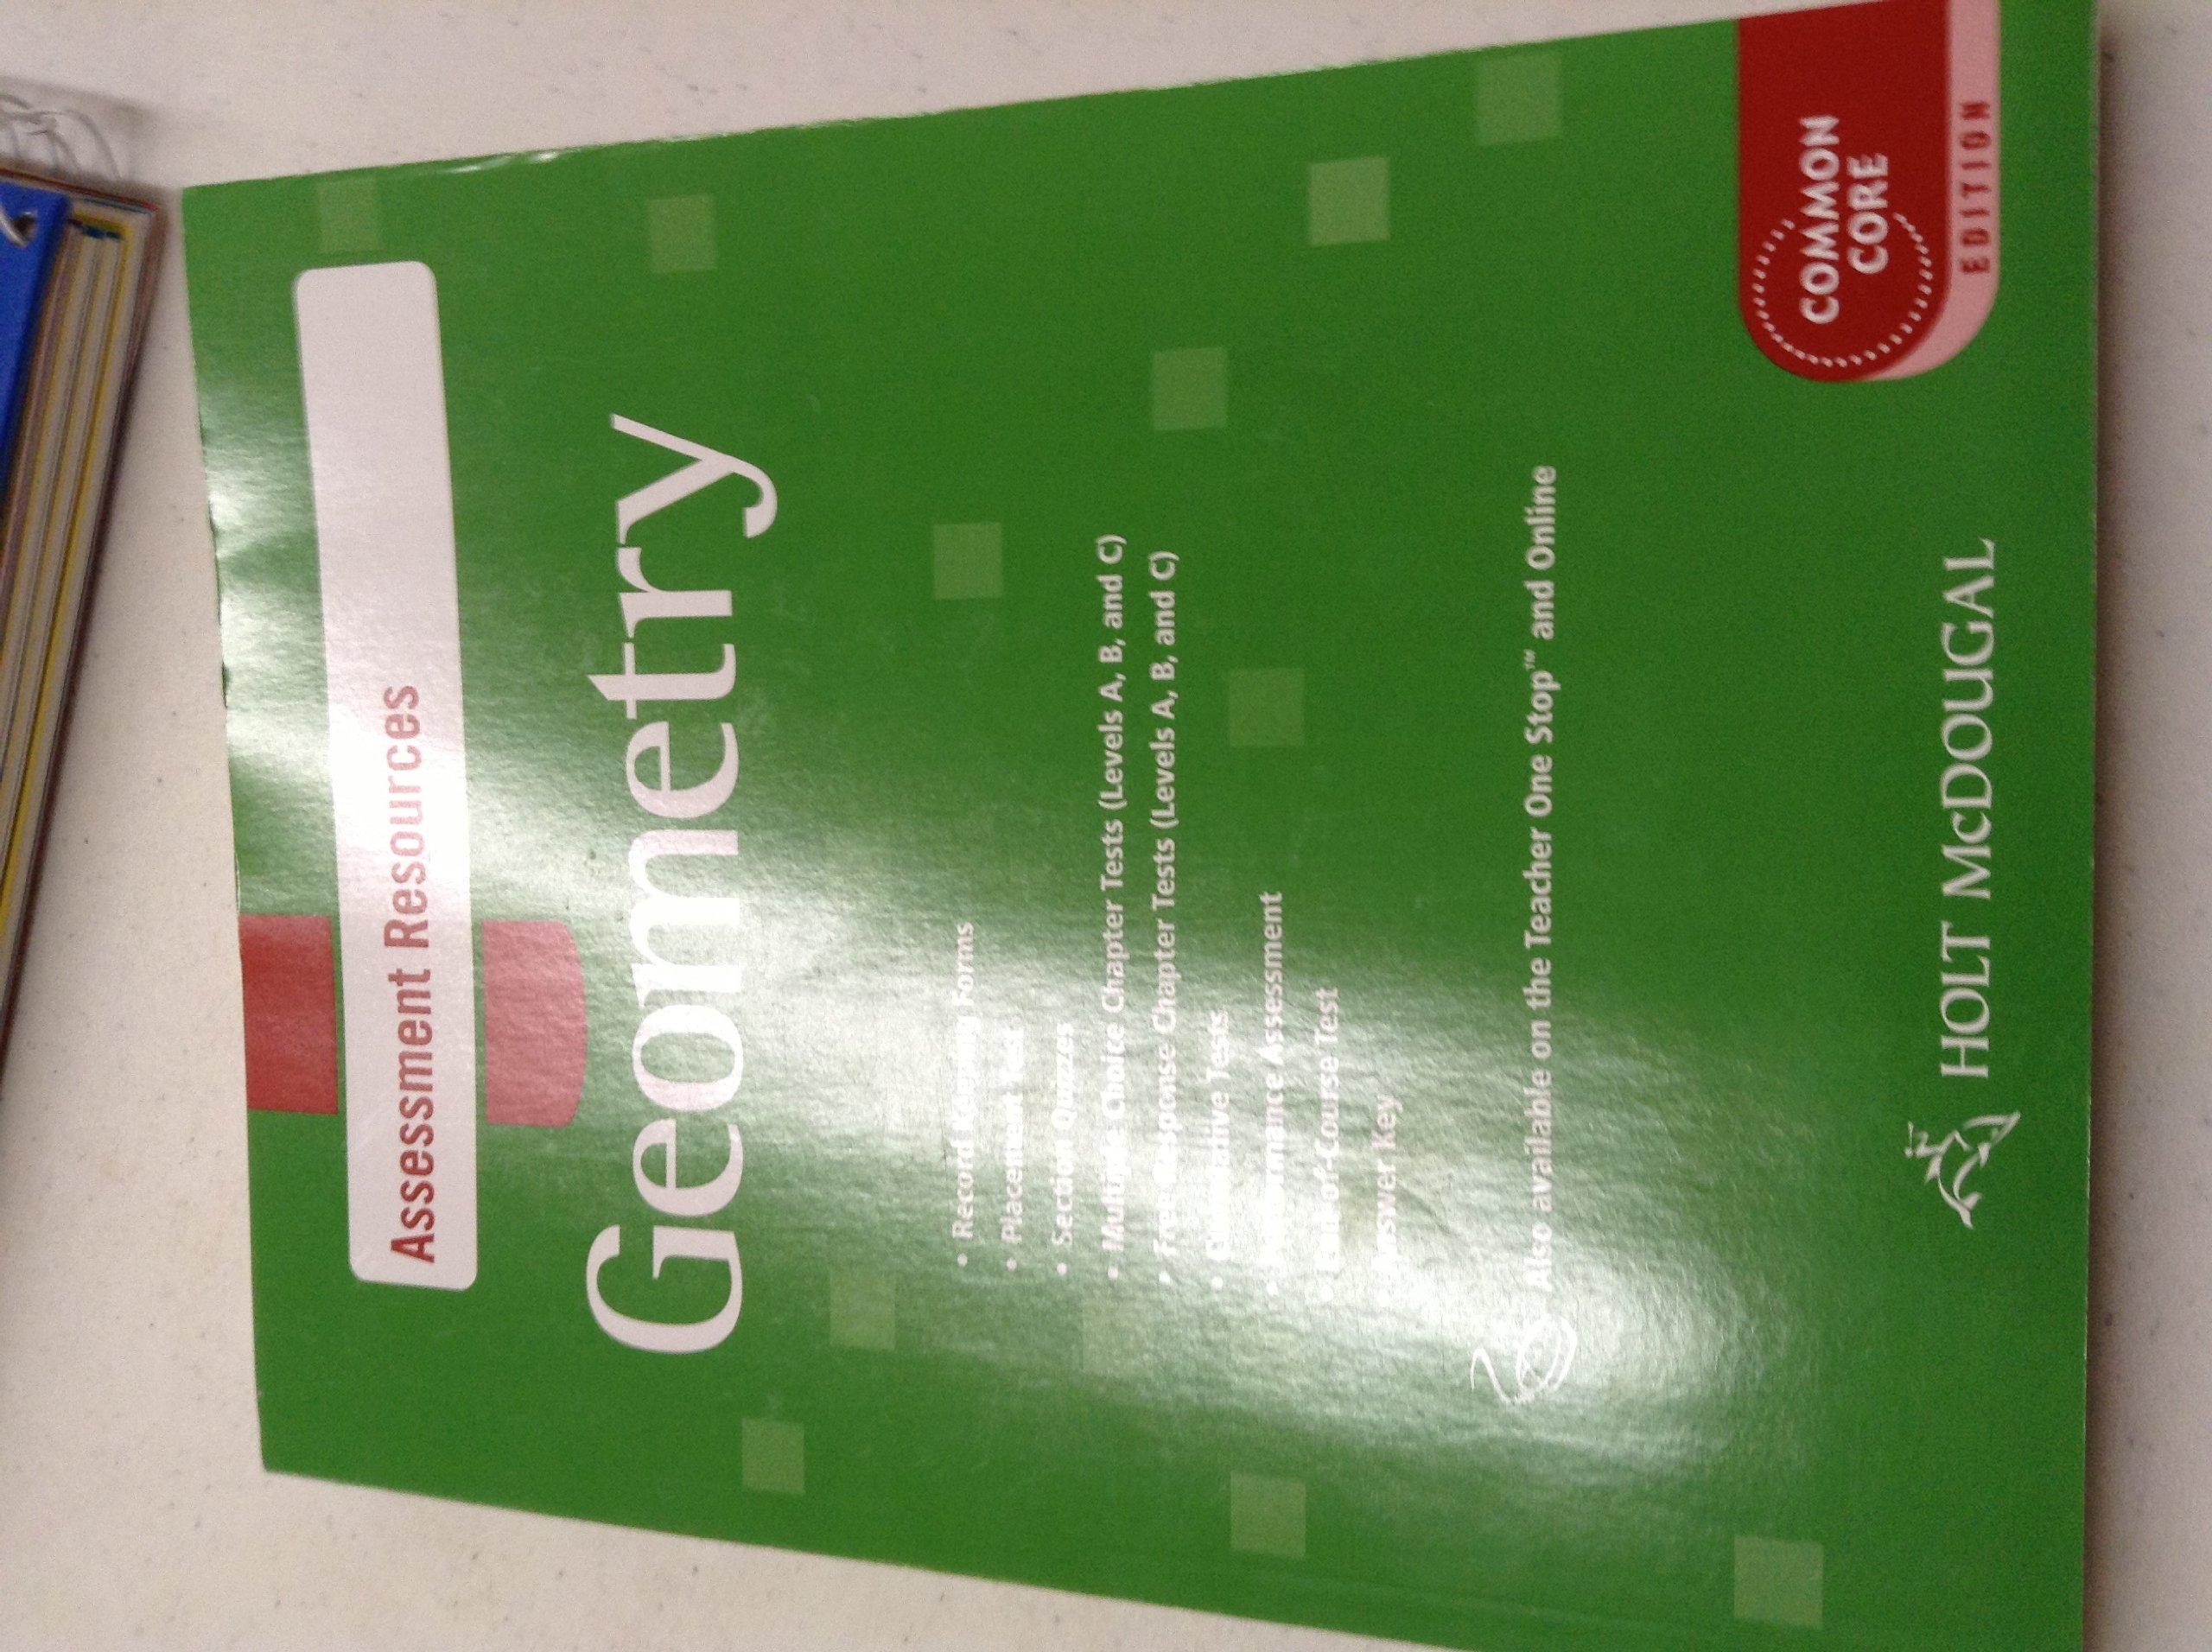 Bestseller: Holt Geometry Chapter Test Answer Key